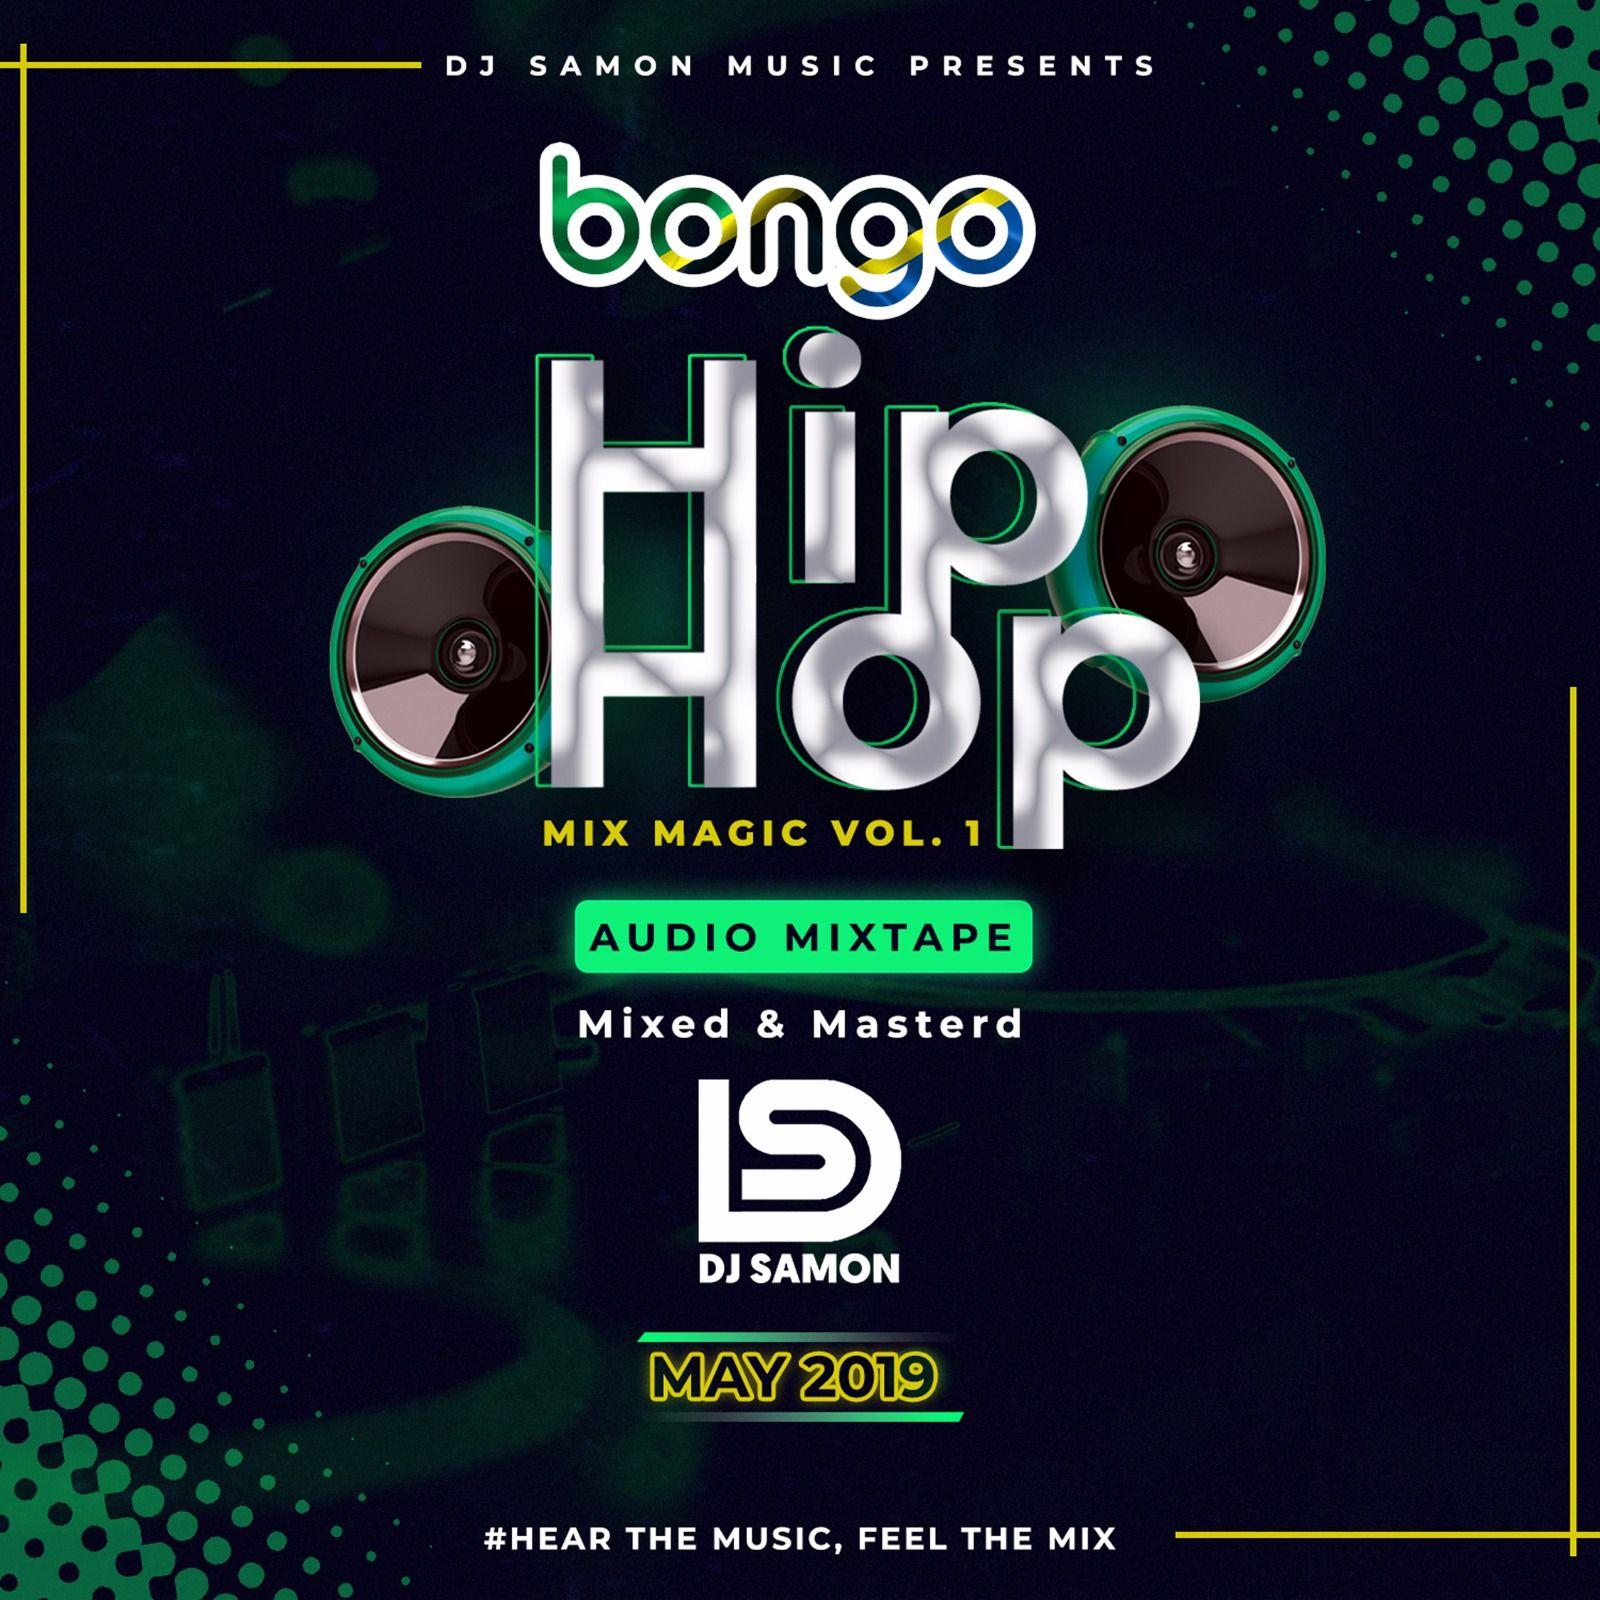 BONGO HIP HOP (Mix Magic Vol 1) by Dj Samon from Dj Samon: Listen